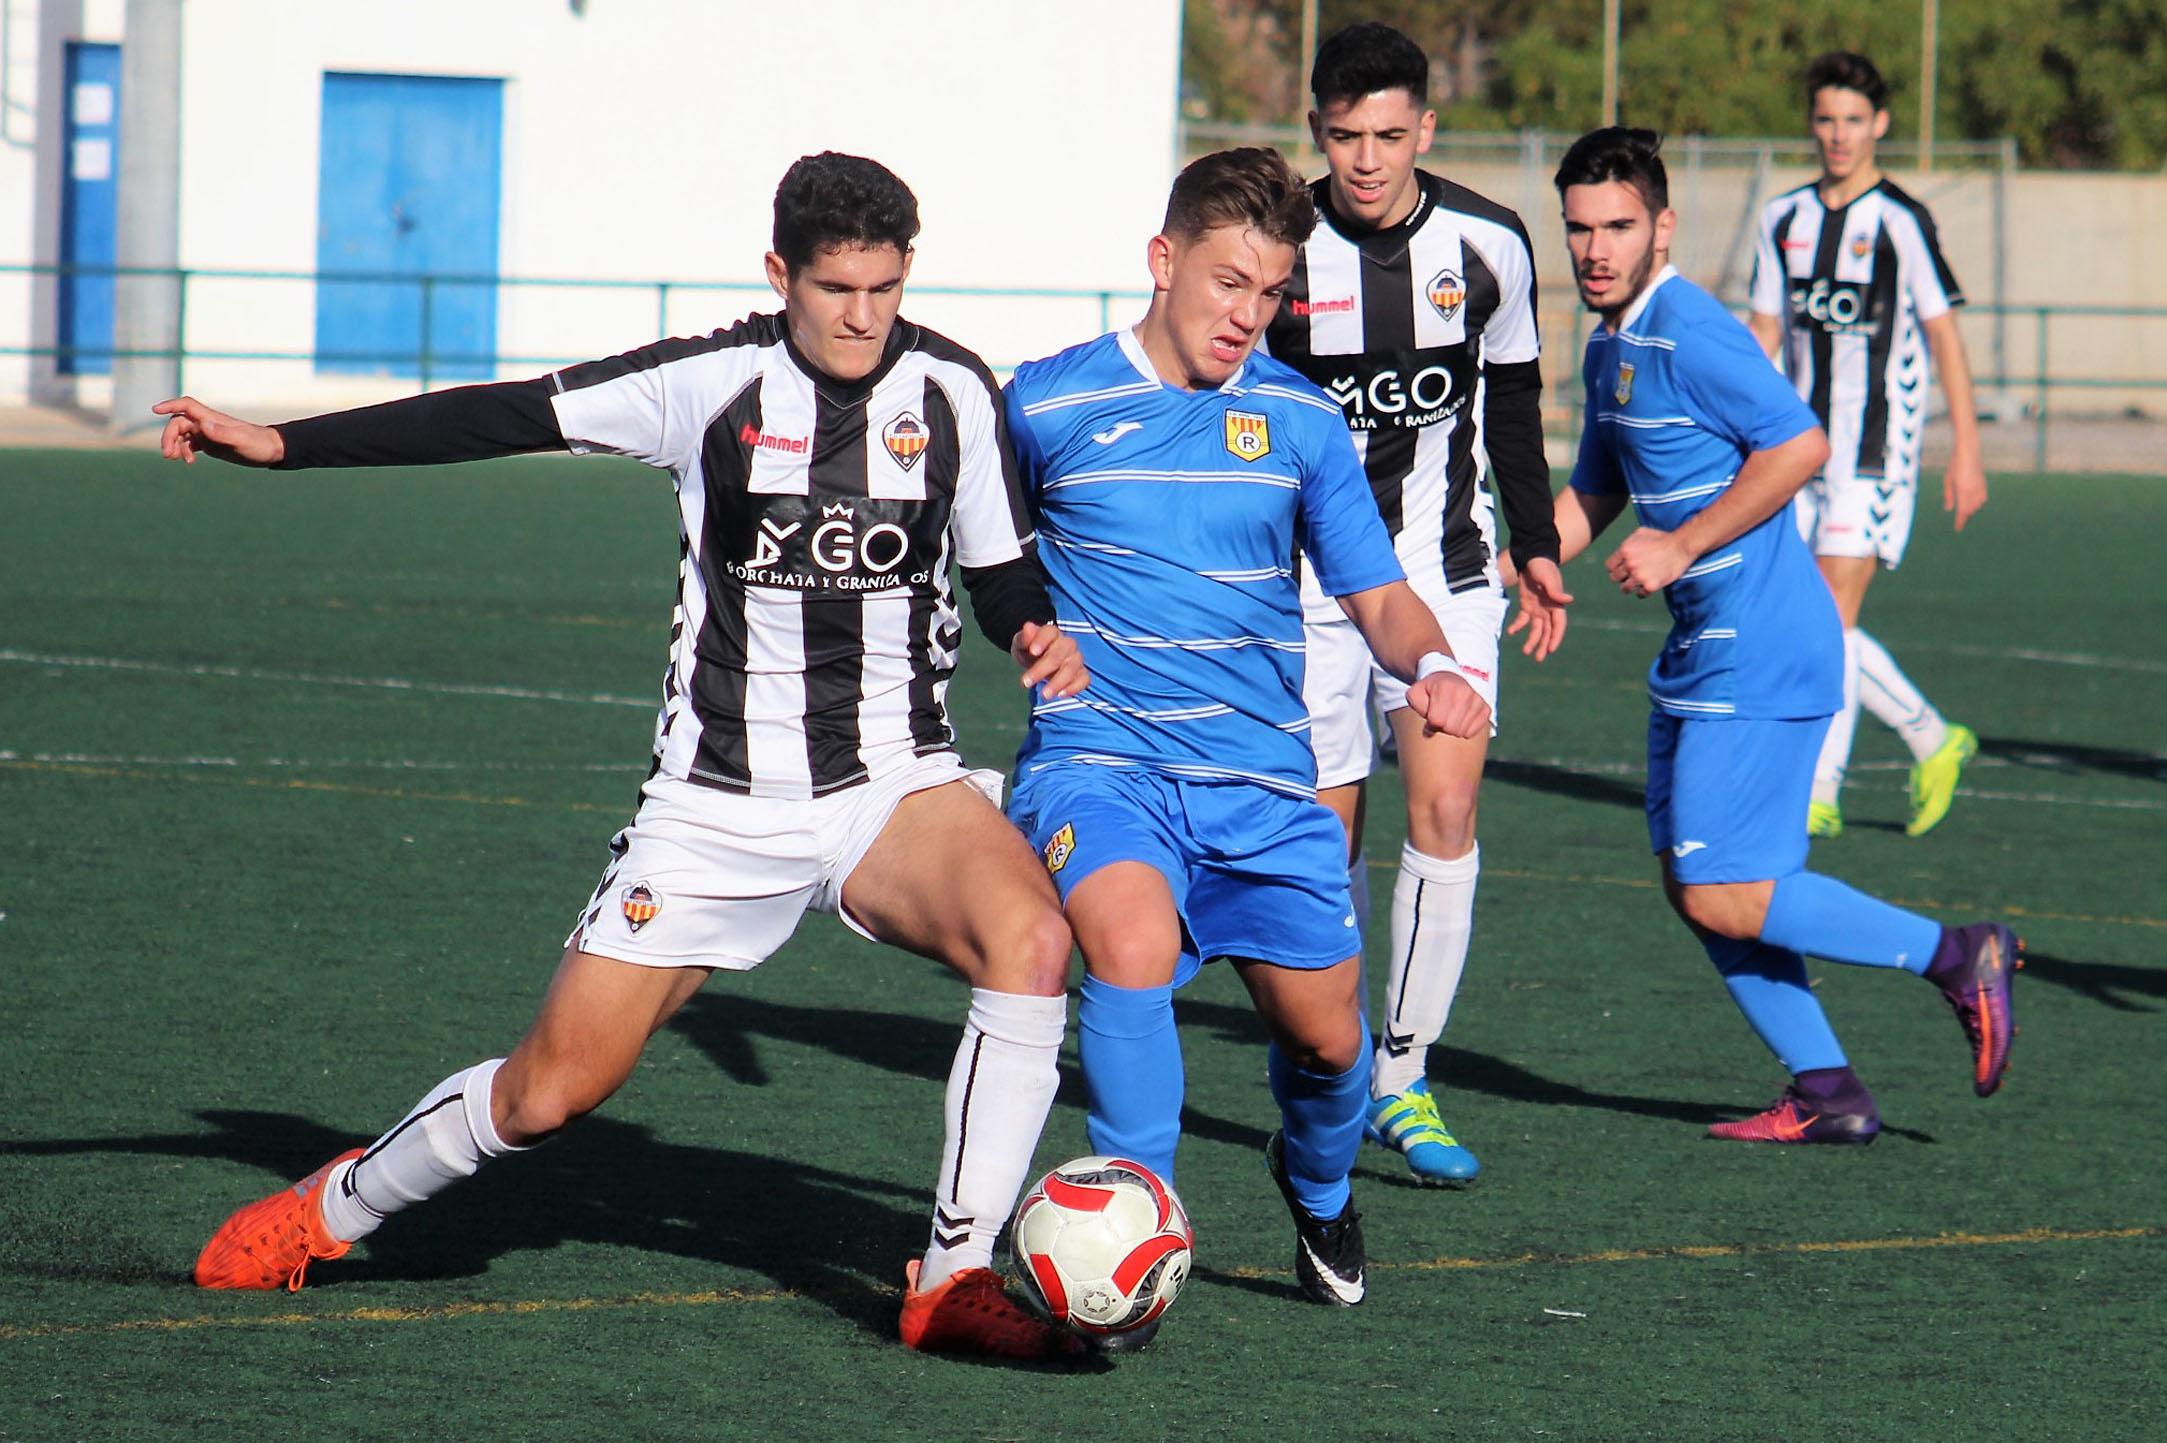 La iii copa federaci n juvenil calienta motores f tbol for Federacion valenciana de futbol